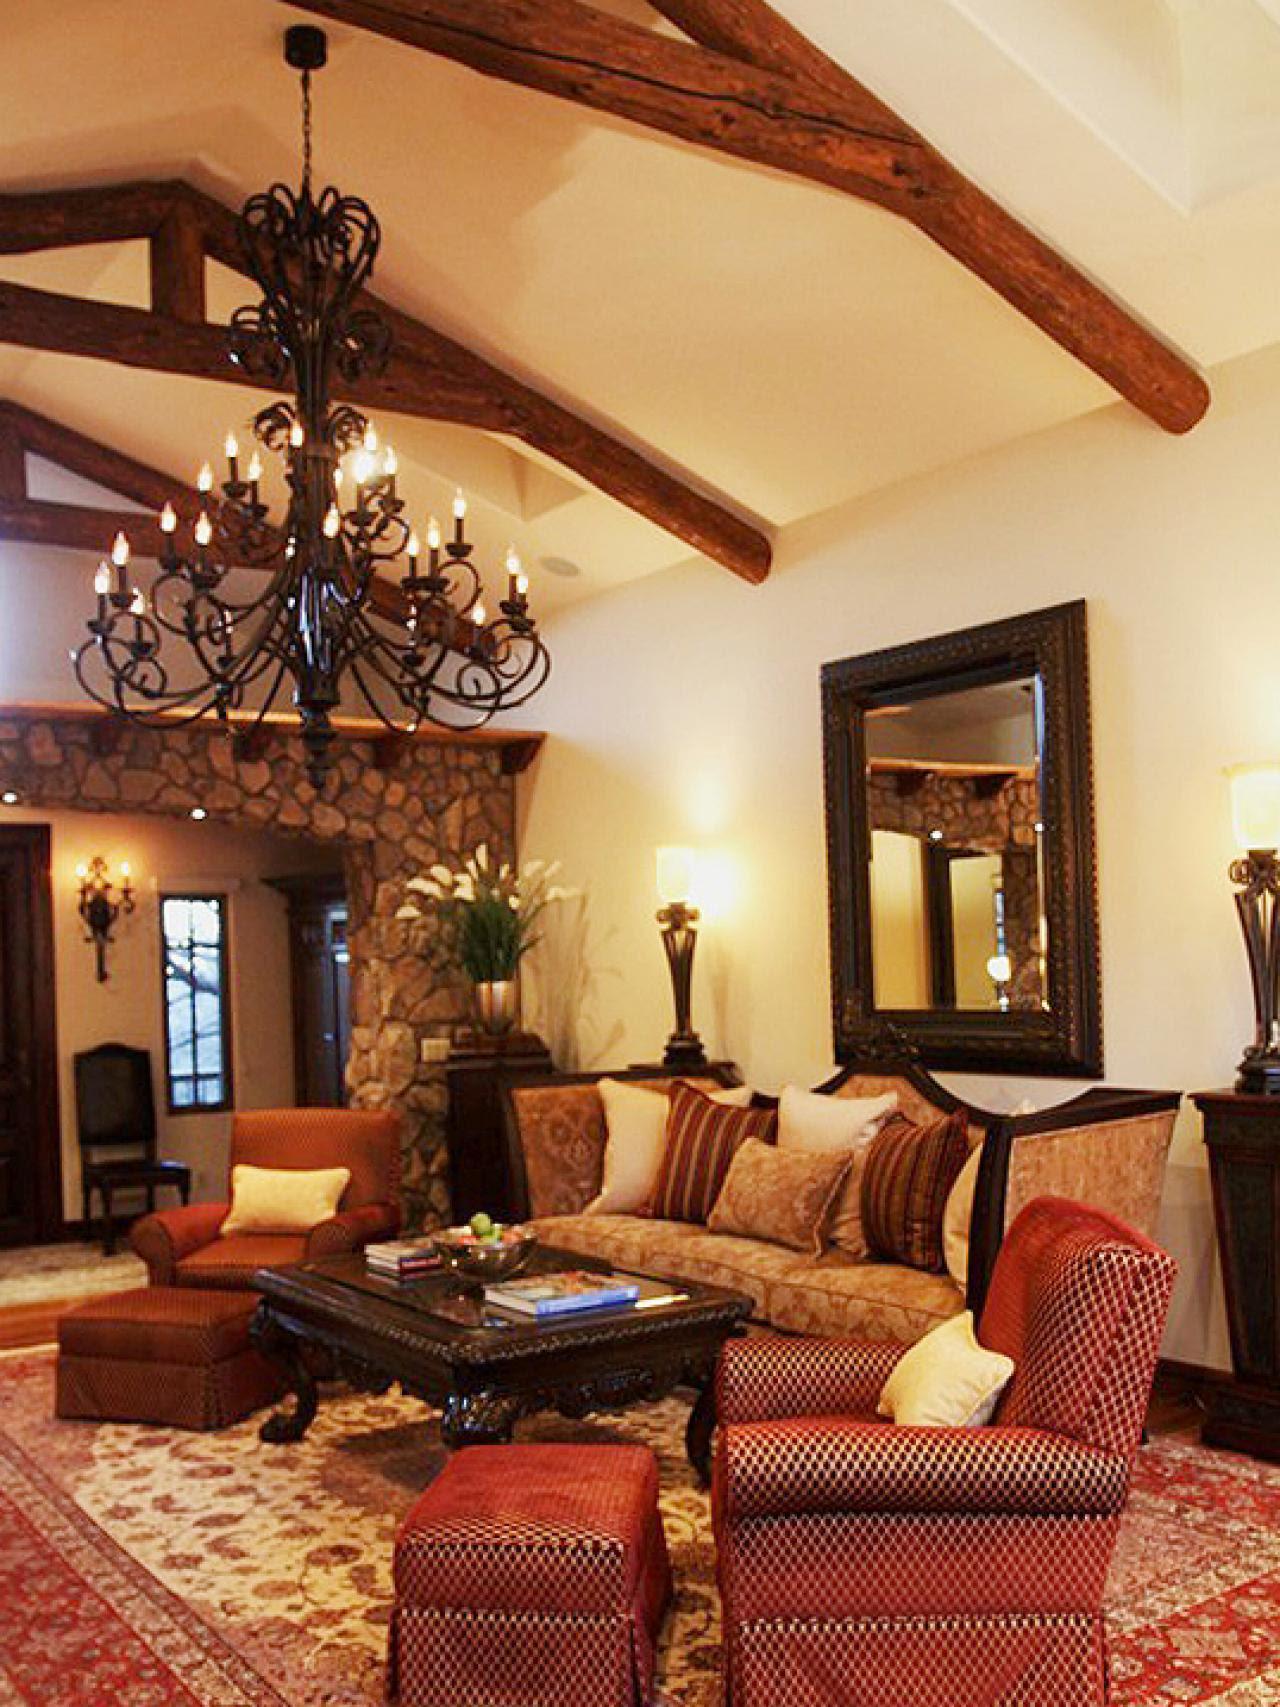 Rustic Living Room Photos | HGTV